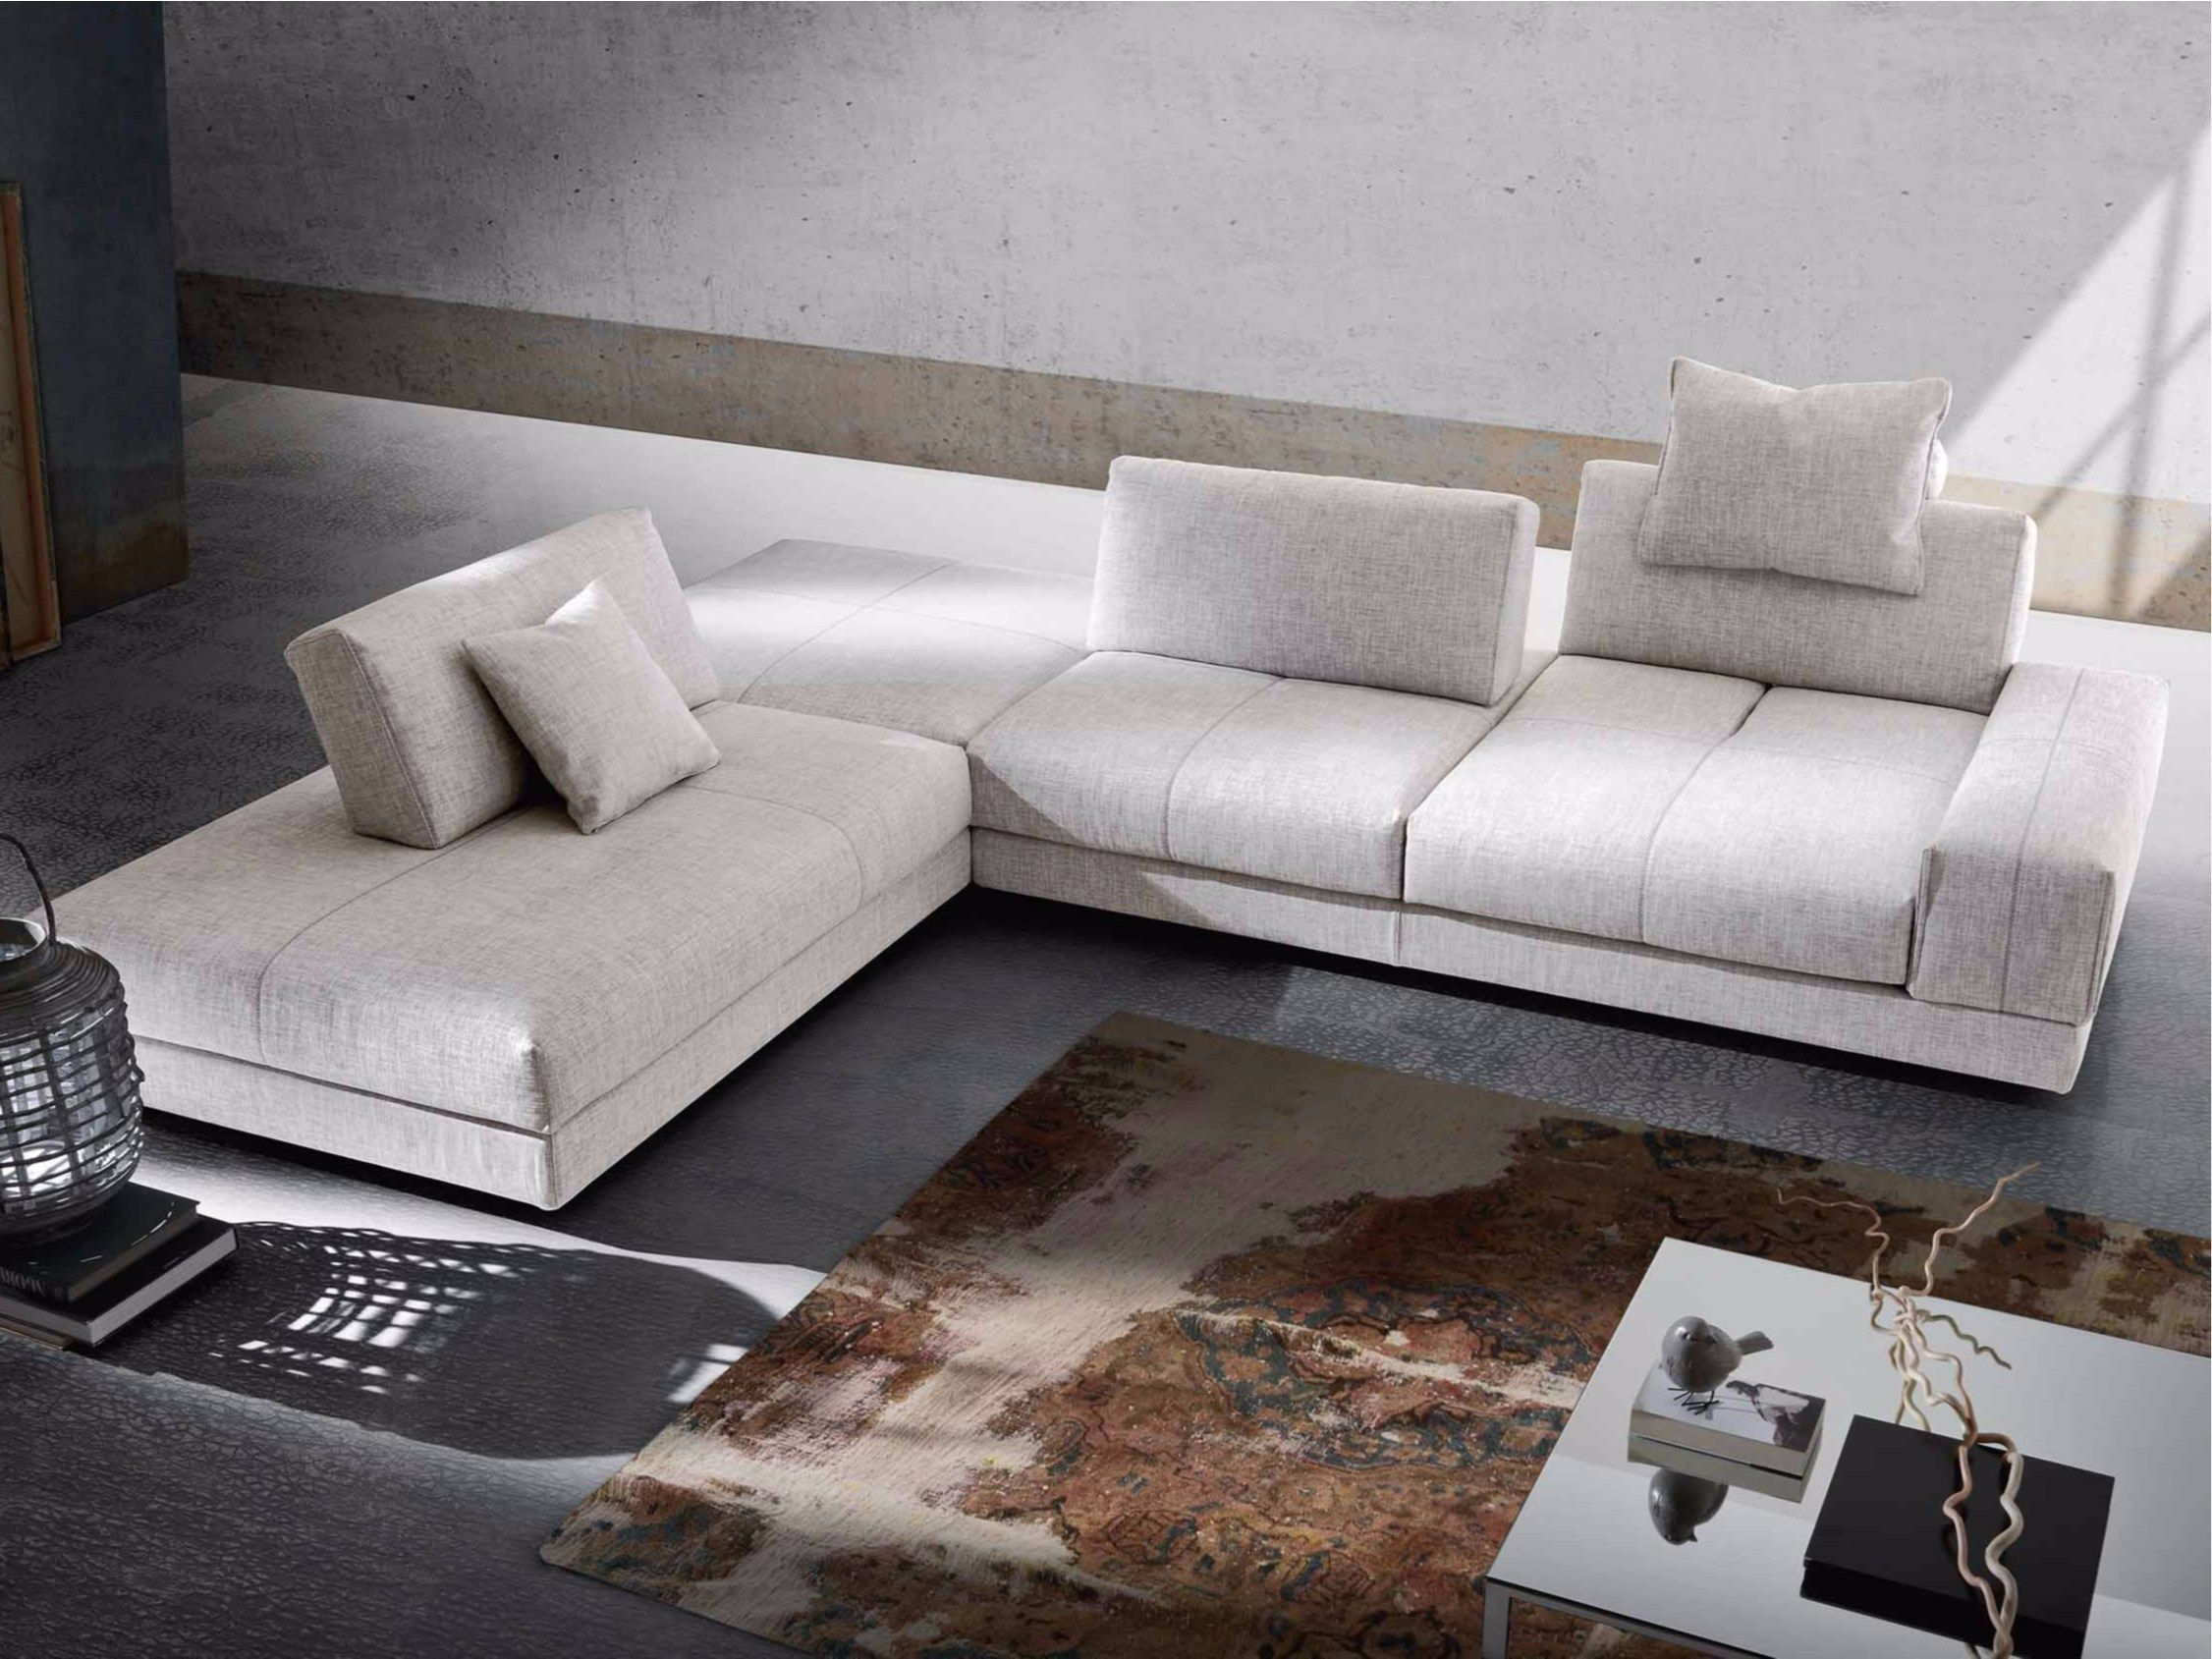 Corner convertible sofa OPEN SPACE by GURIAN design Zeno Nugari